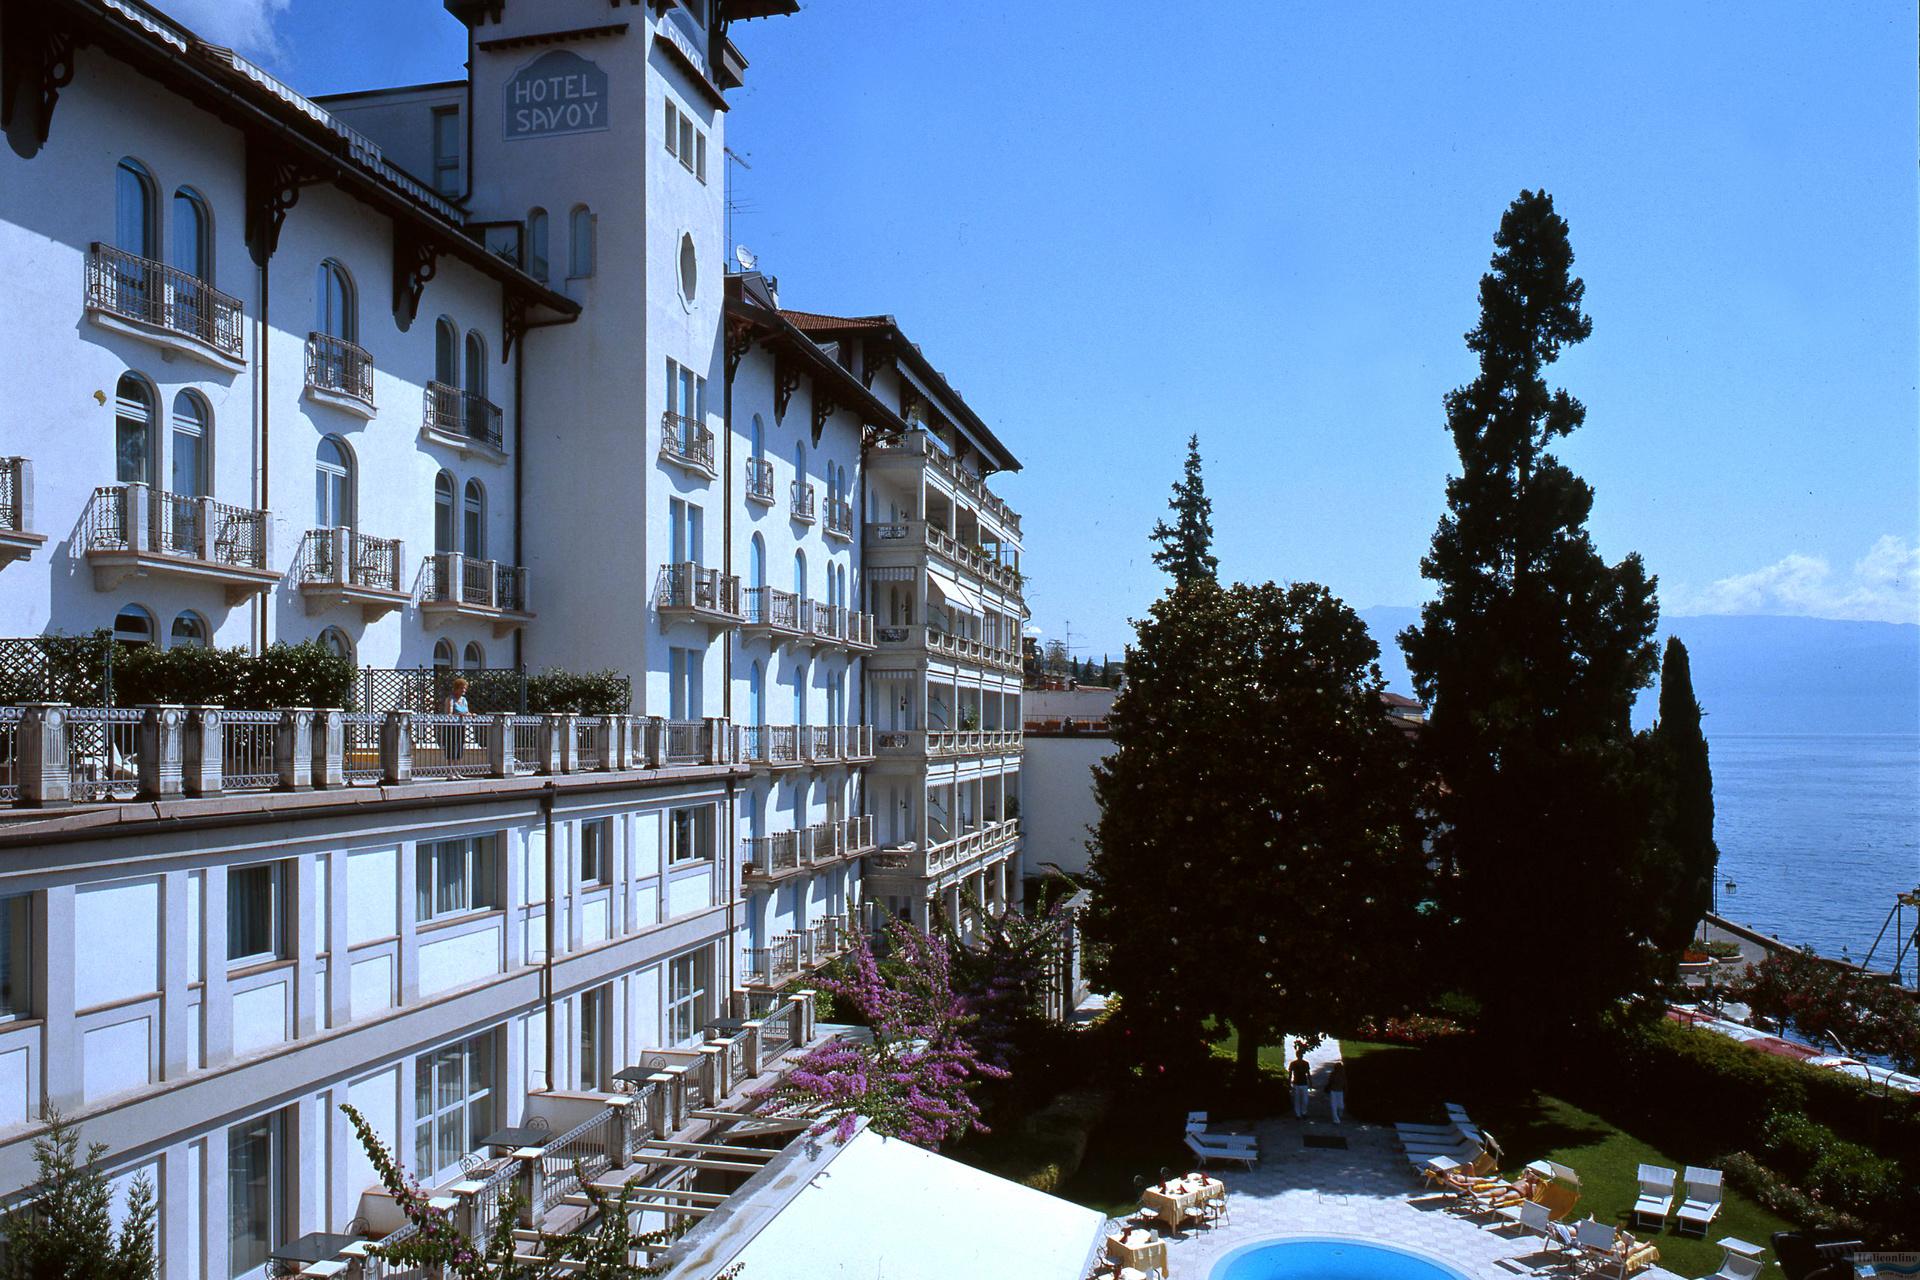 Hotel Savoy Palace Italien Gardasee